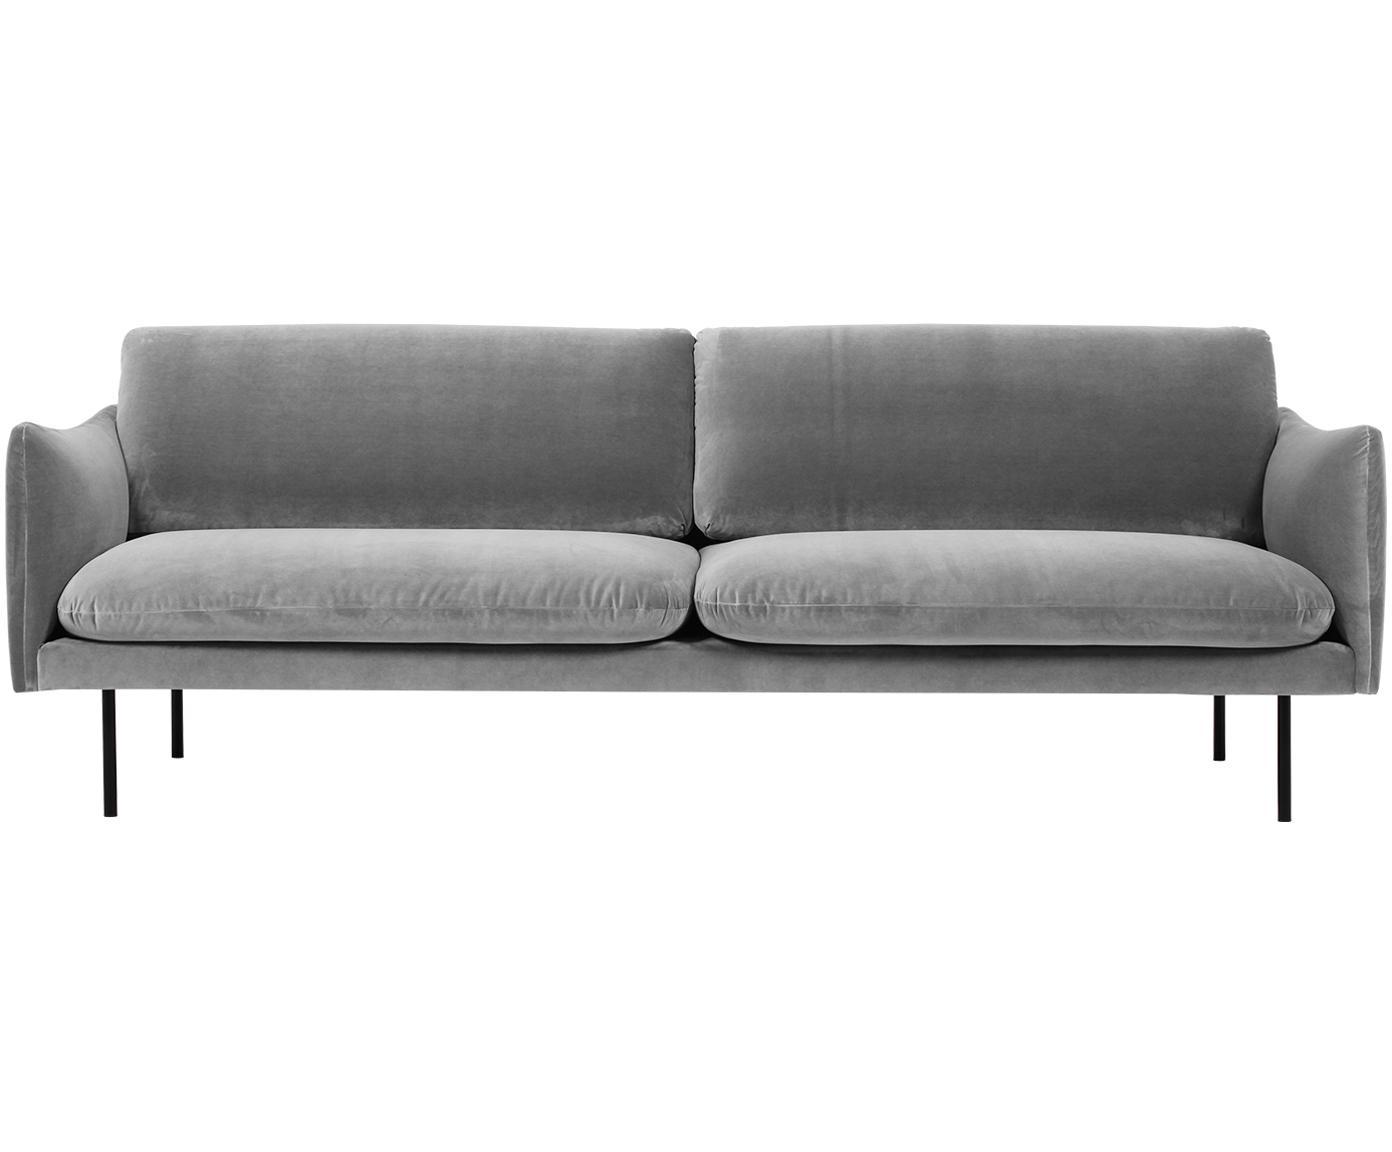 Samt-Sofa Moby (3-Sitzer), Bezug: Samt (Hochwertiger Polyes, Gestell: Massives Kiefernholz, Samt Grau, B 220 x T 95 cm